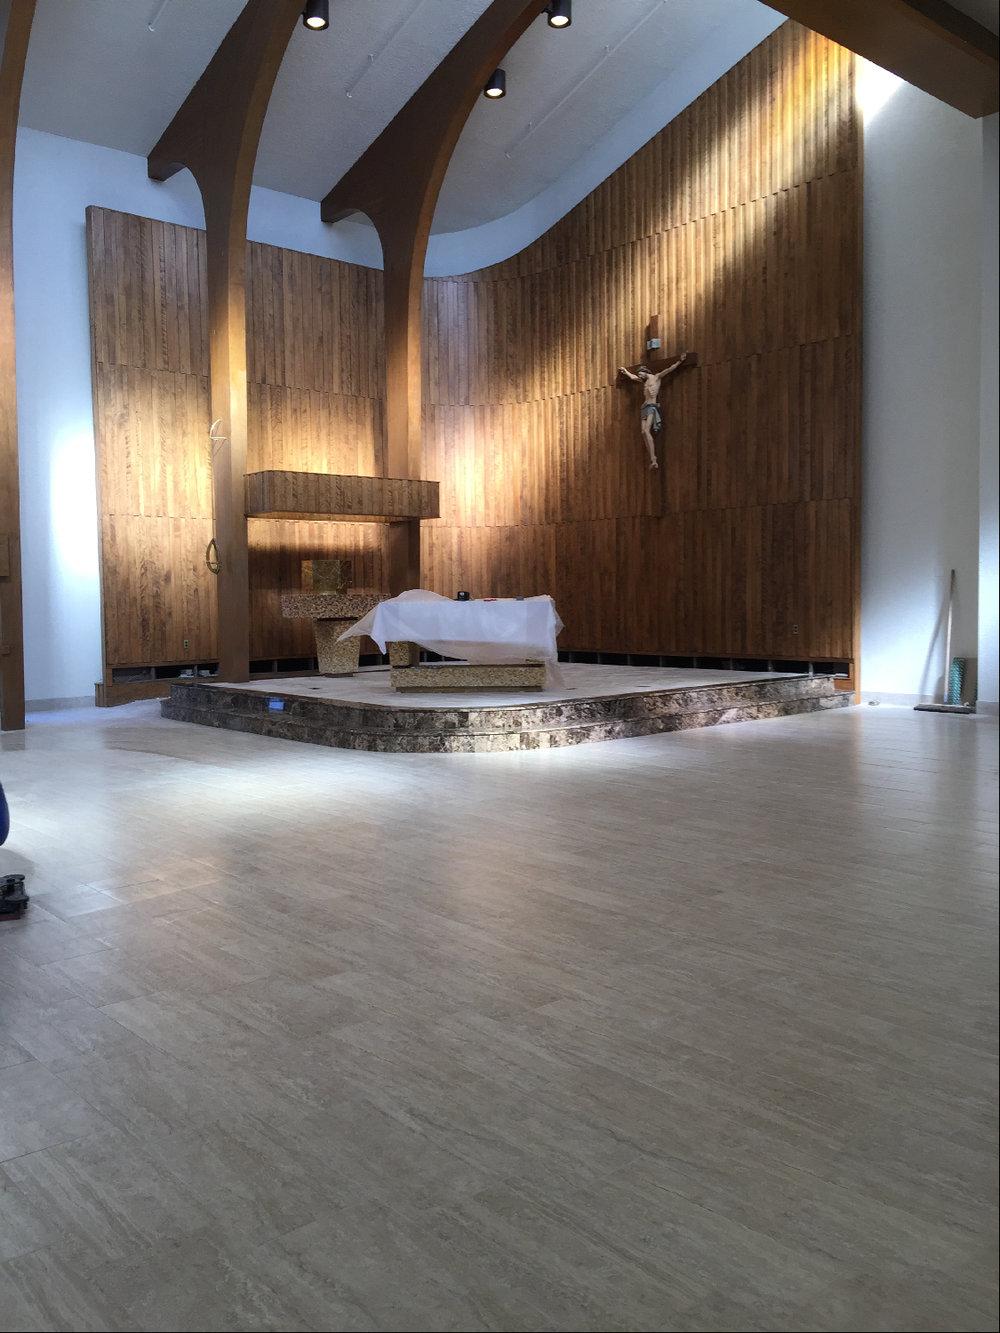 Chapel, Totowa, NJ